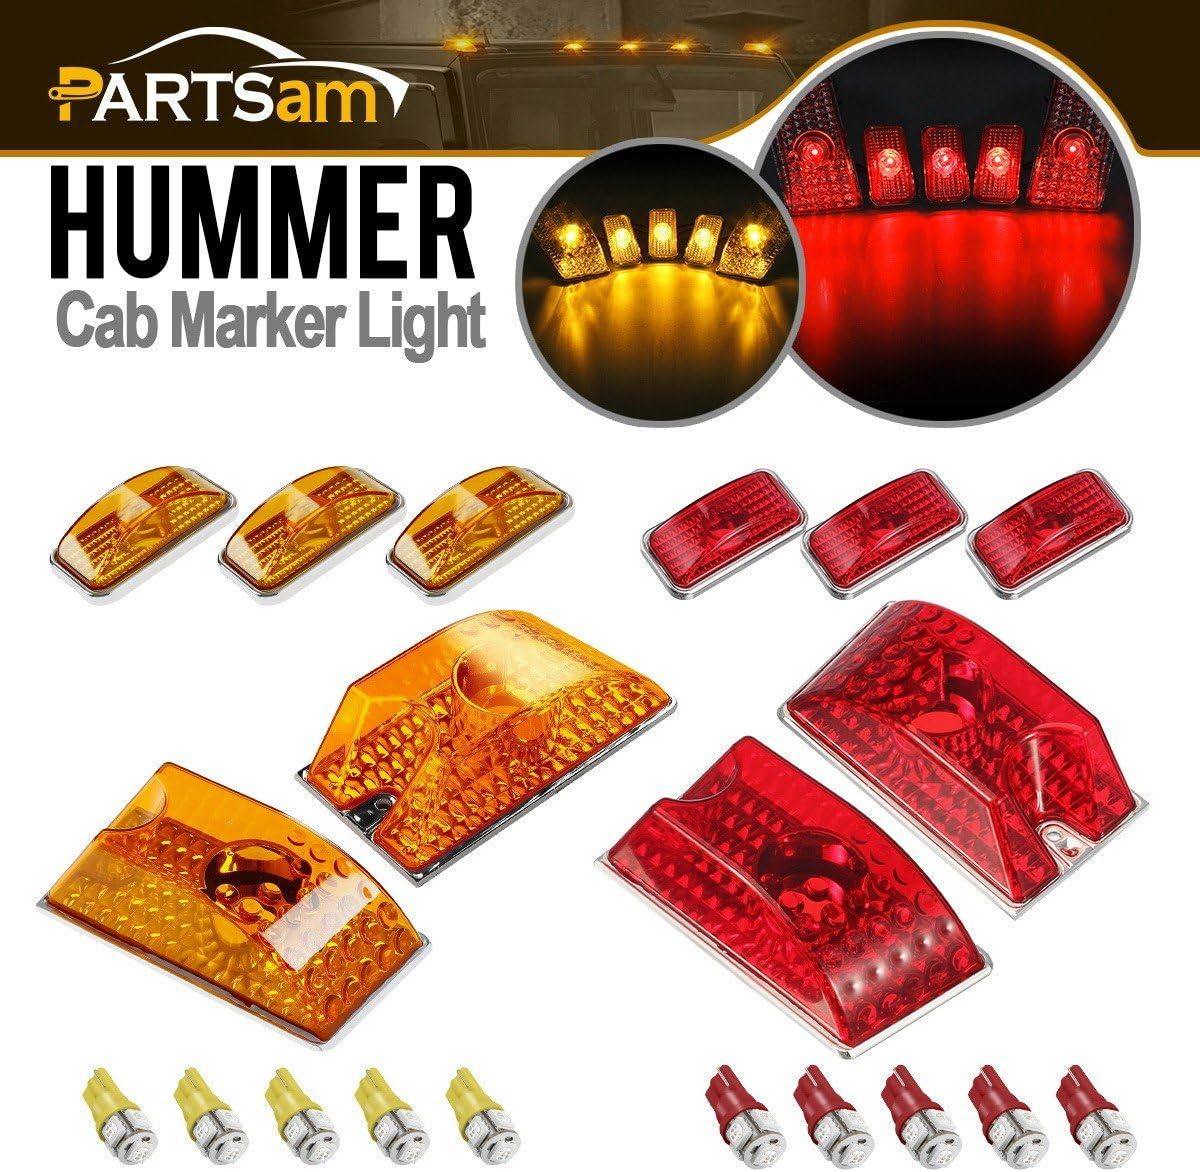 Partsam 格安SALEスタート 10pcs Red Amber Lens 264160 Roof Running 販売 Crys Cab Marker